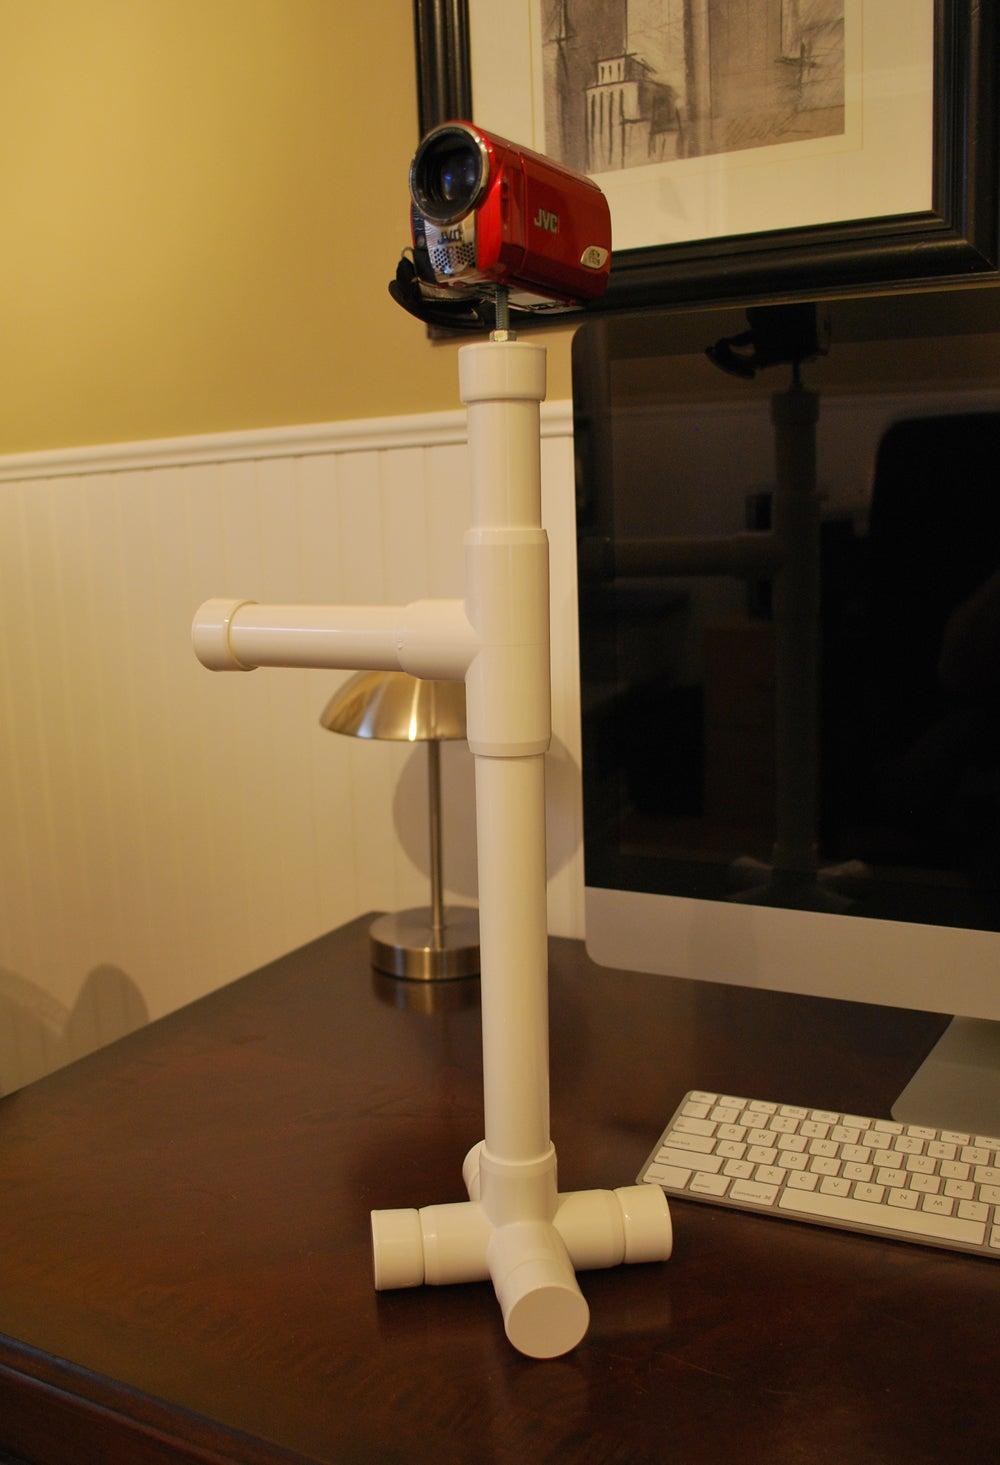 How to Build a PVC Steadicam ($14 Steadicam Redux)